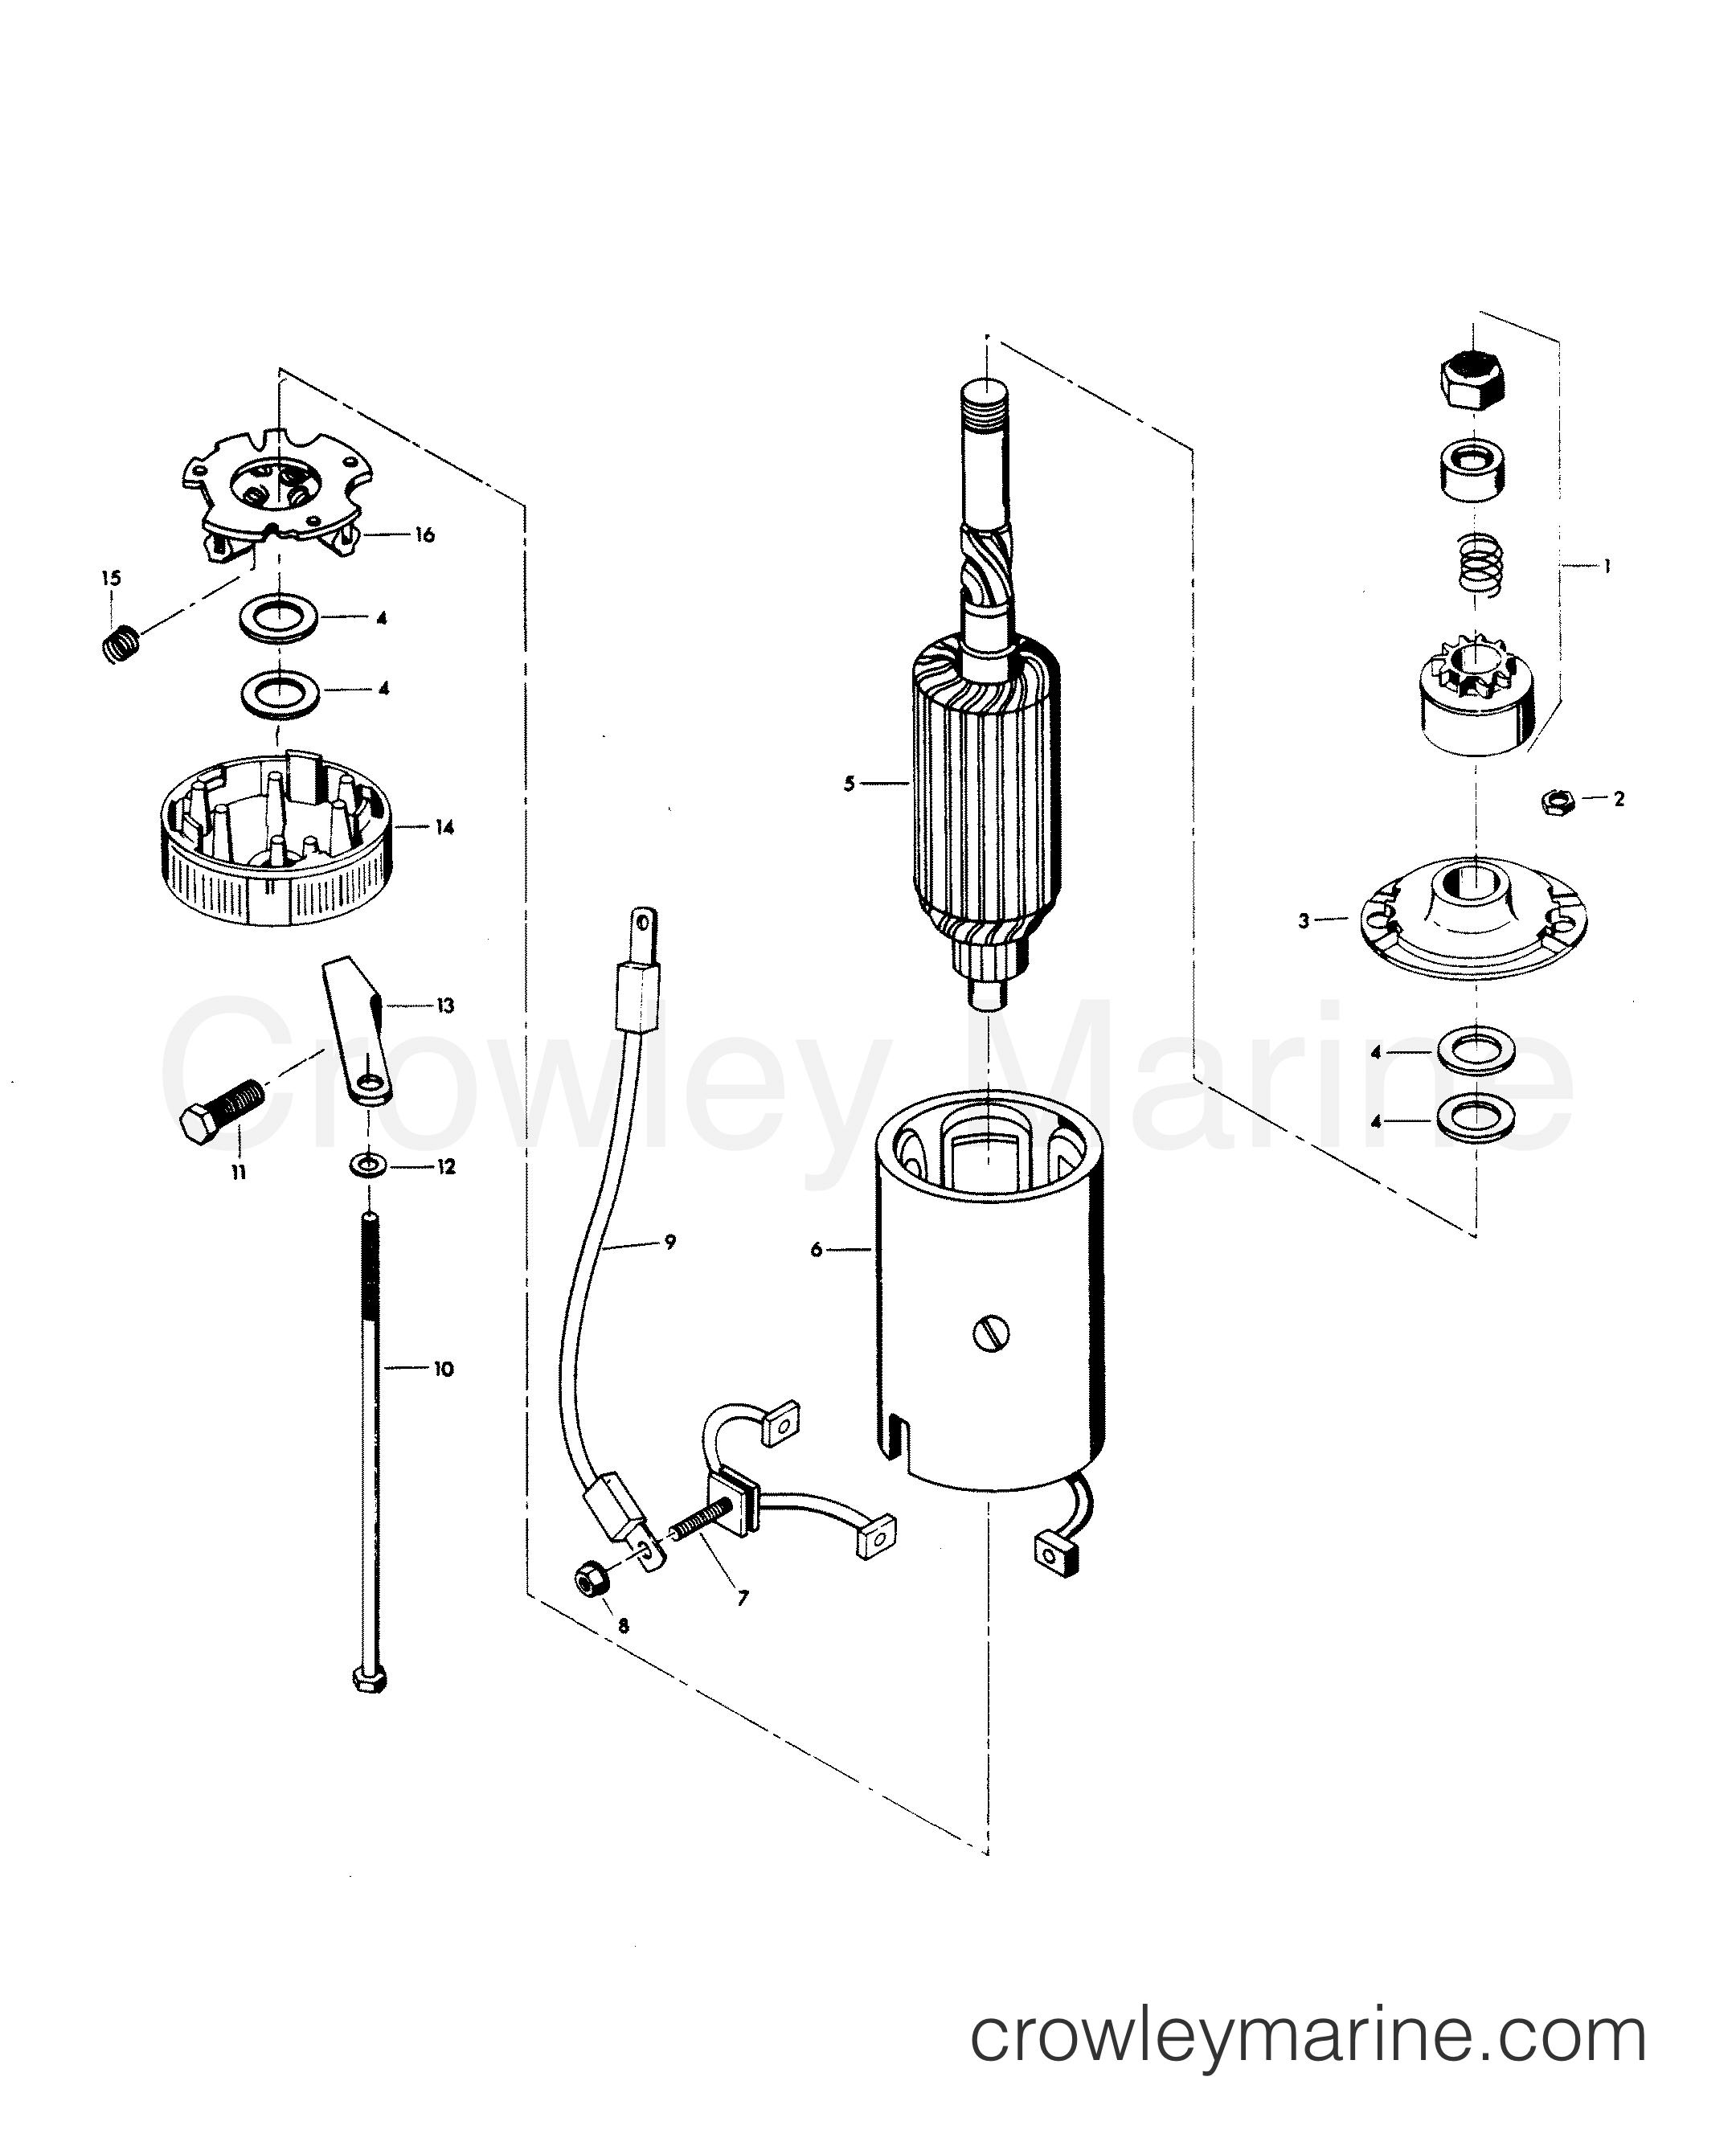 1982 Force Outboard 140 - H1408H82D - STARTER